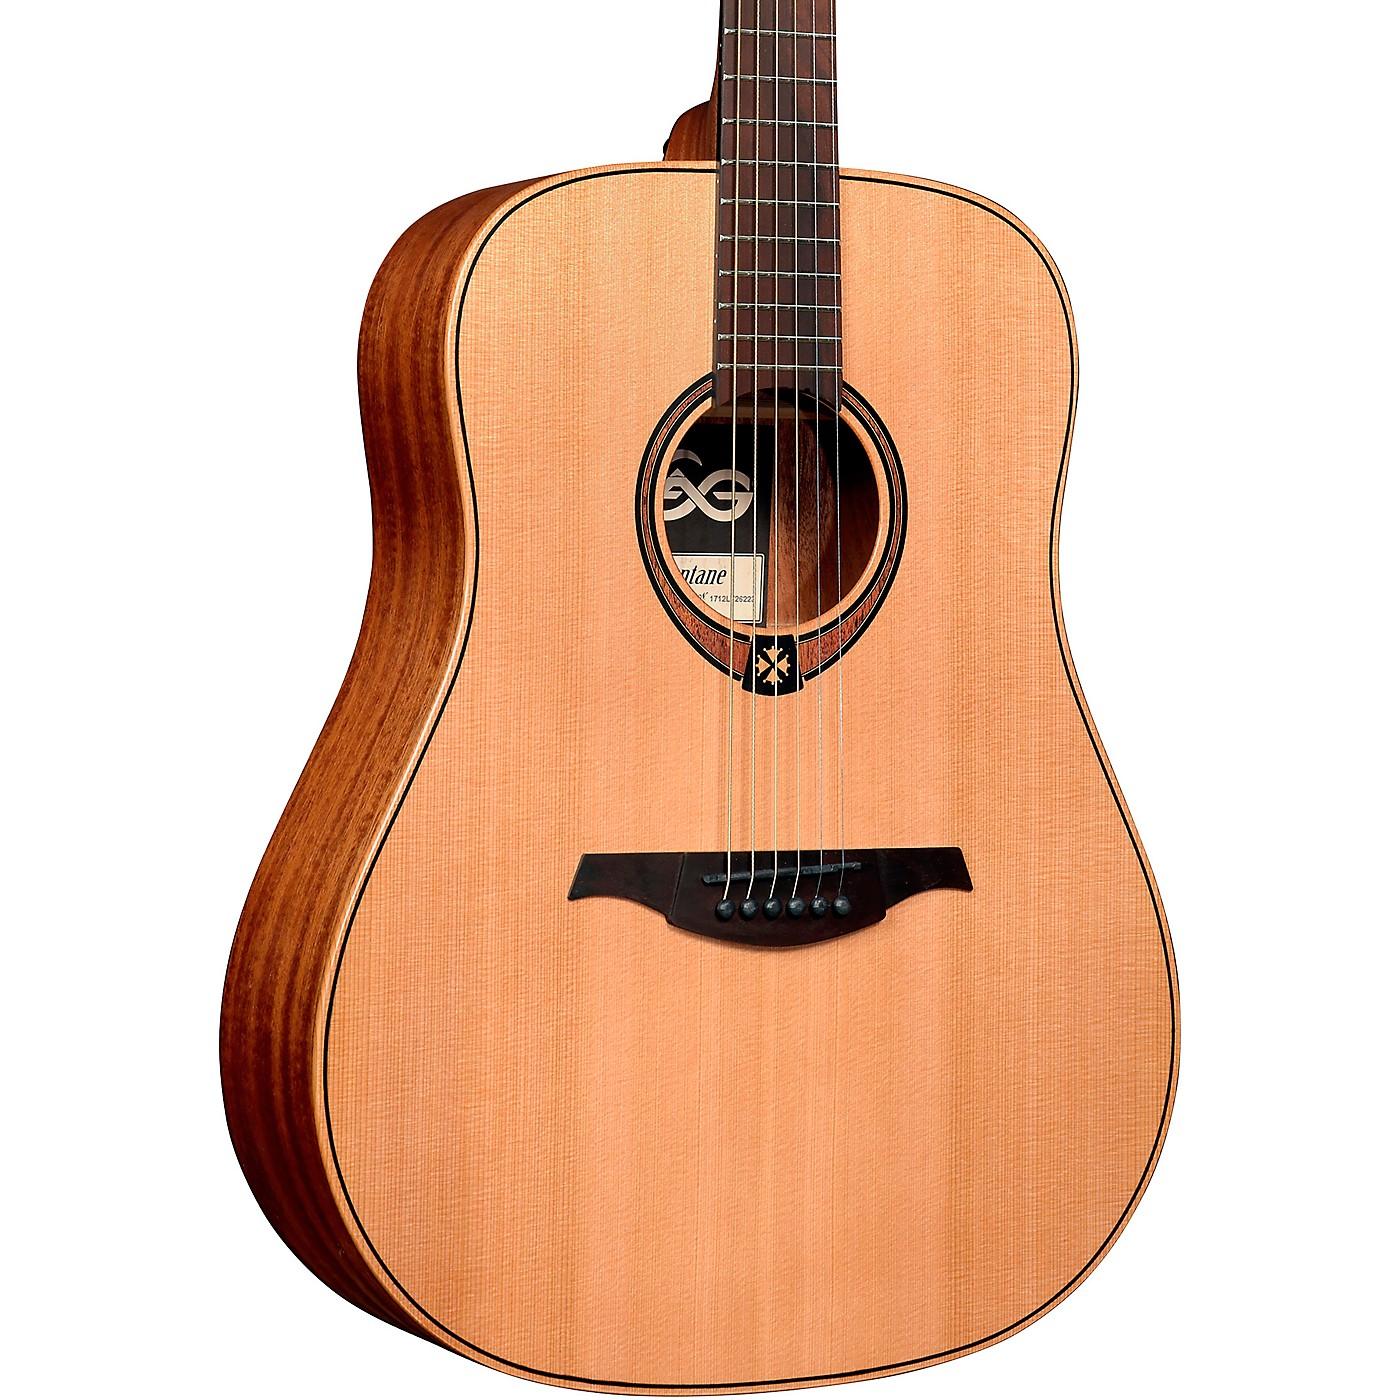 Lag Guitars Tramontane T170D Dreadnought Acoustic Guitar thumbnail